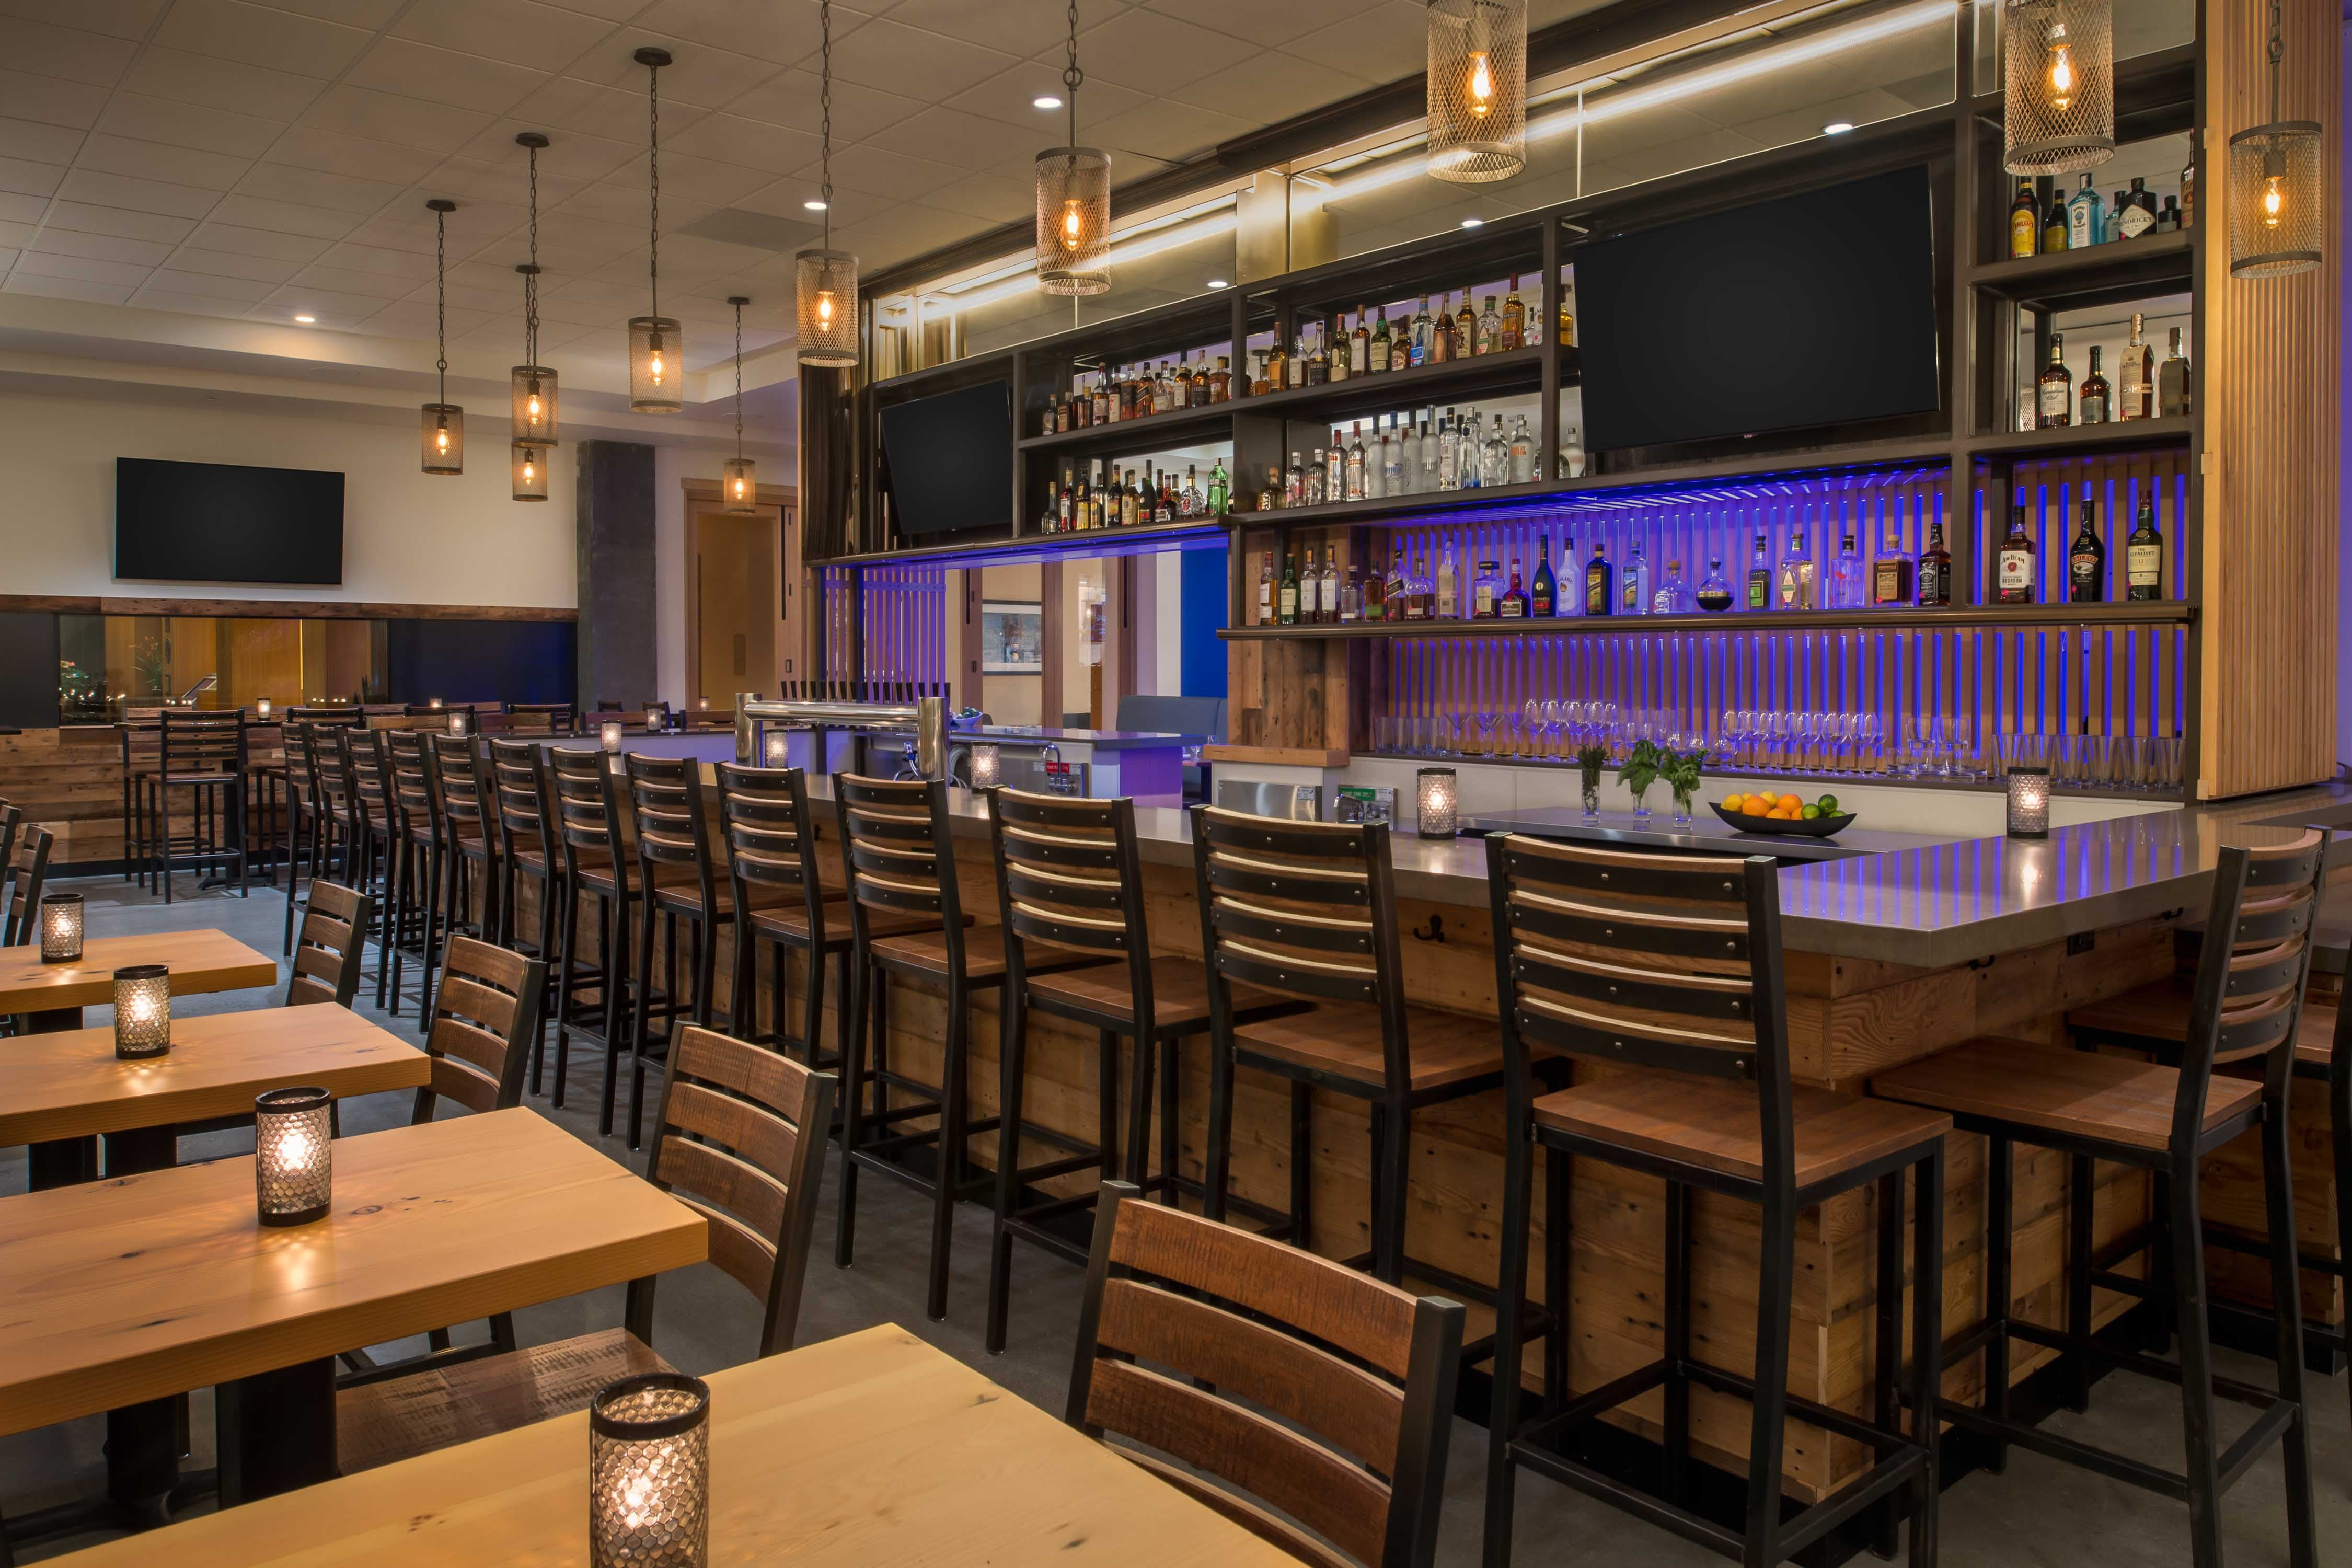 Hilton vancouver grays bar 0001 1